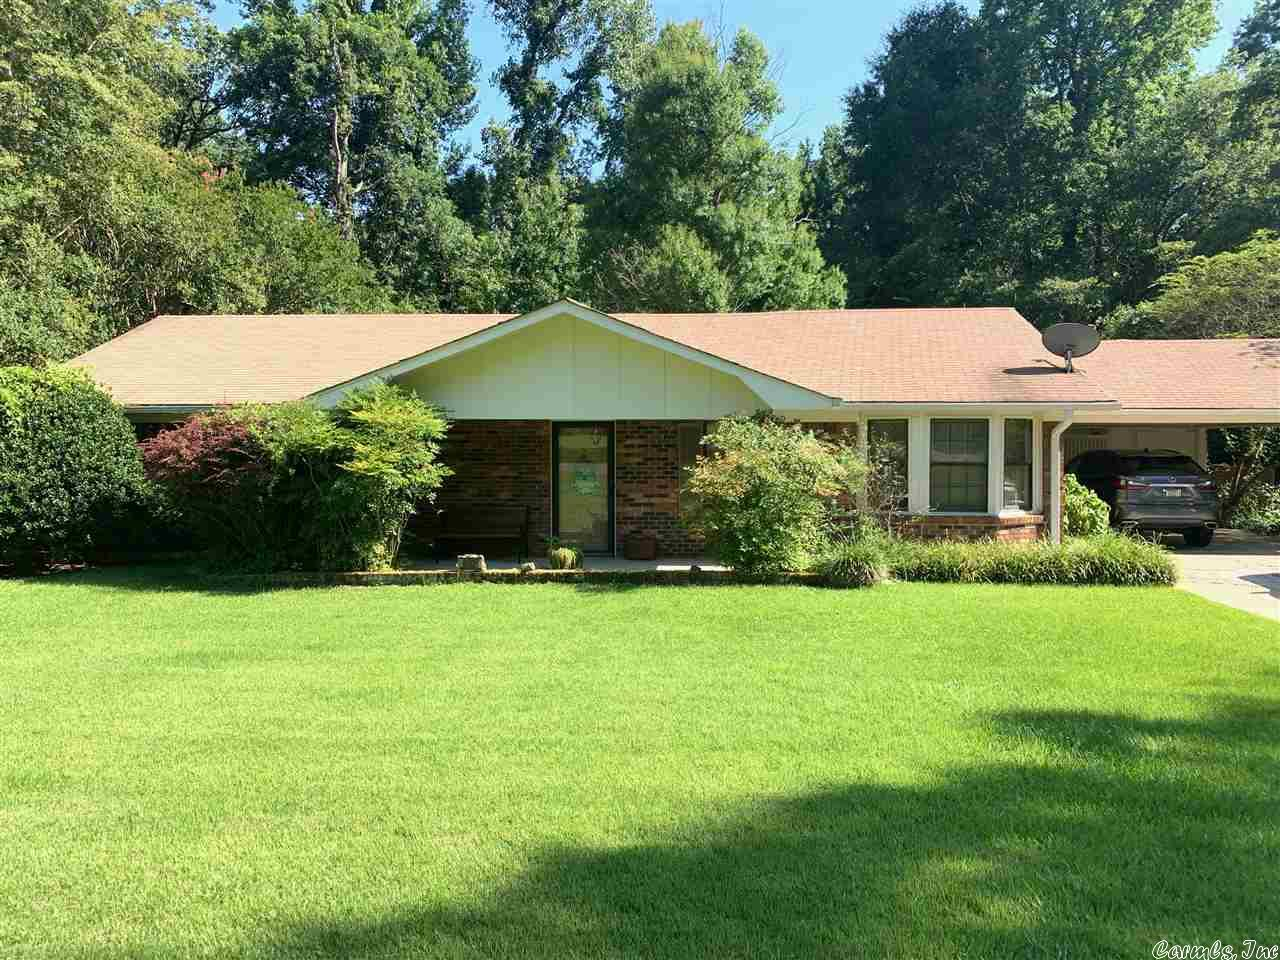 8006 S Pinewood, Pine Bluff, AR 71603